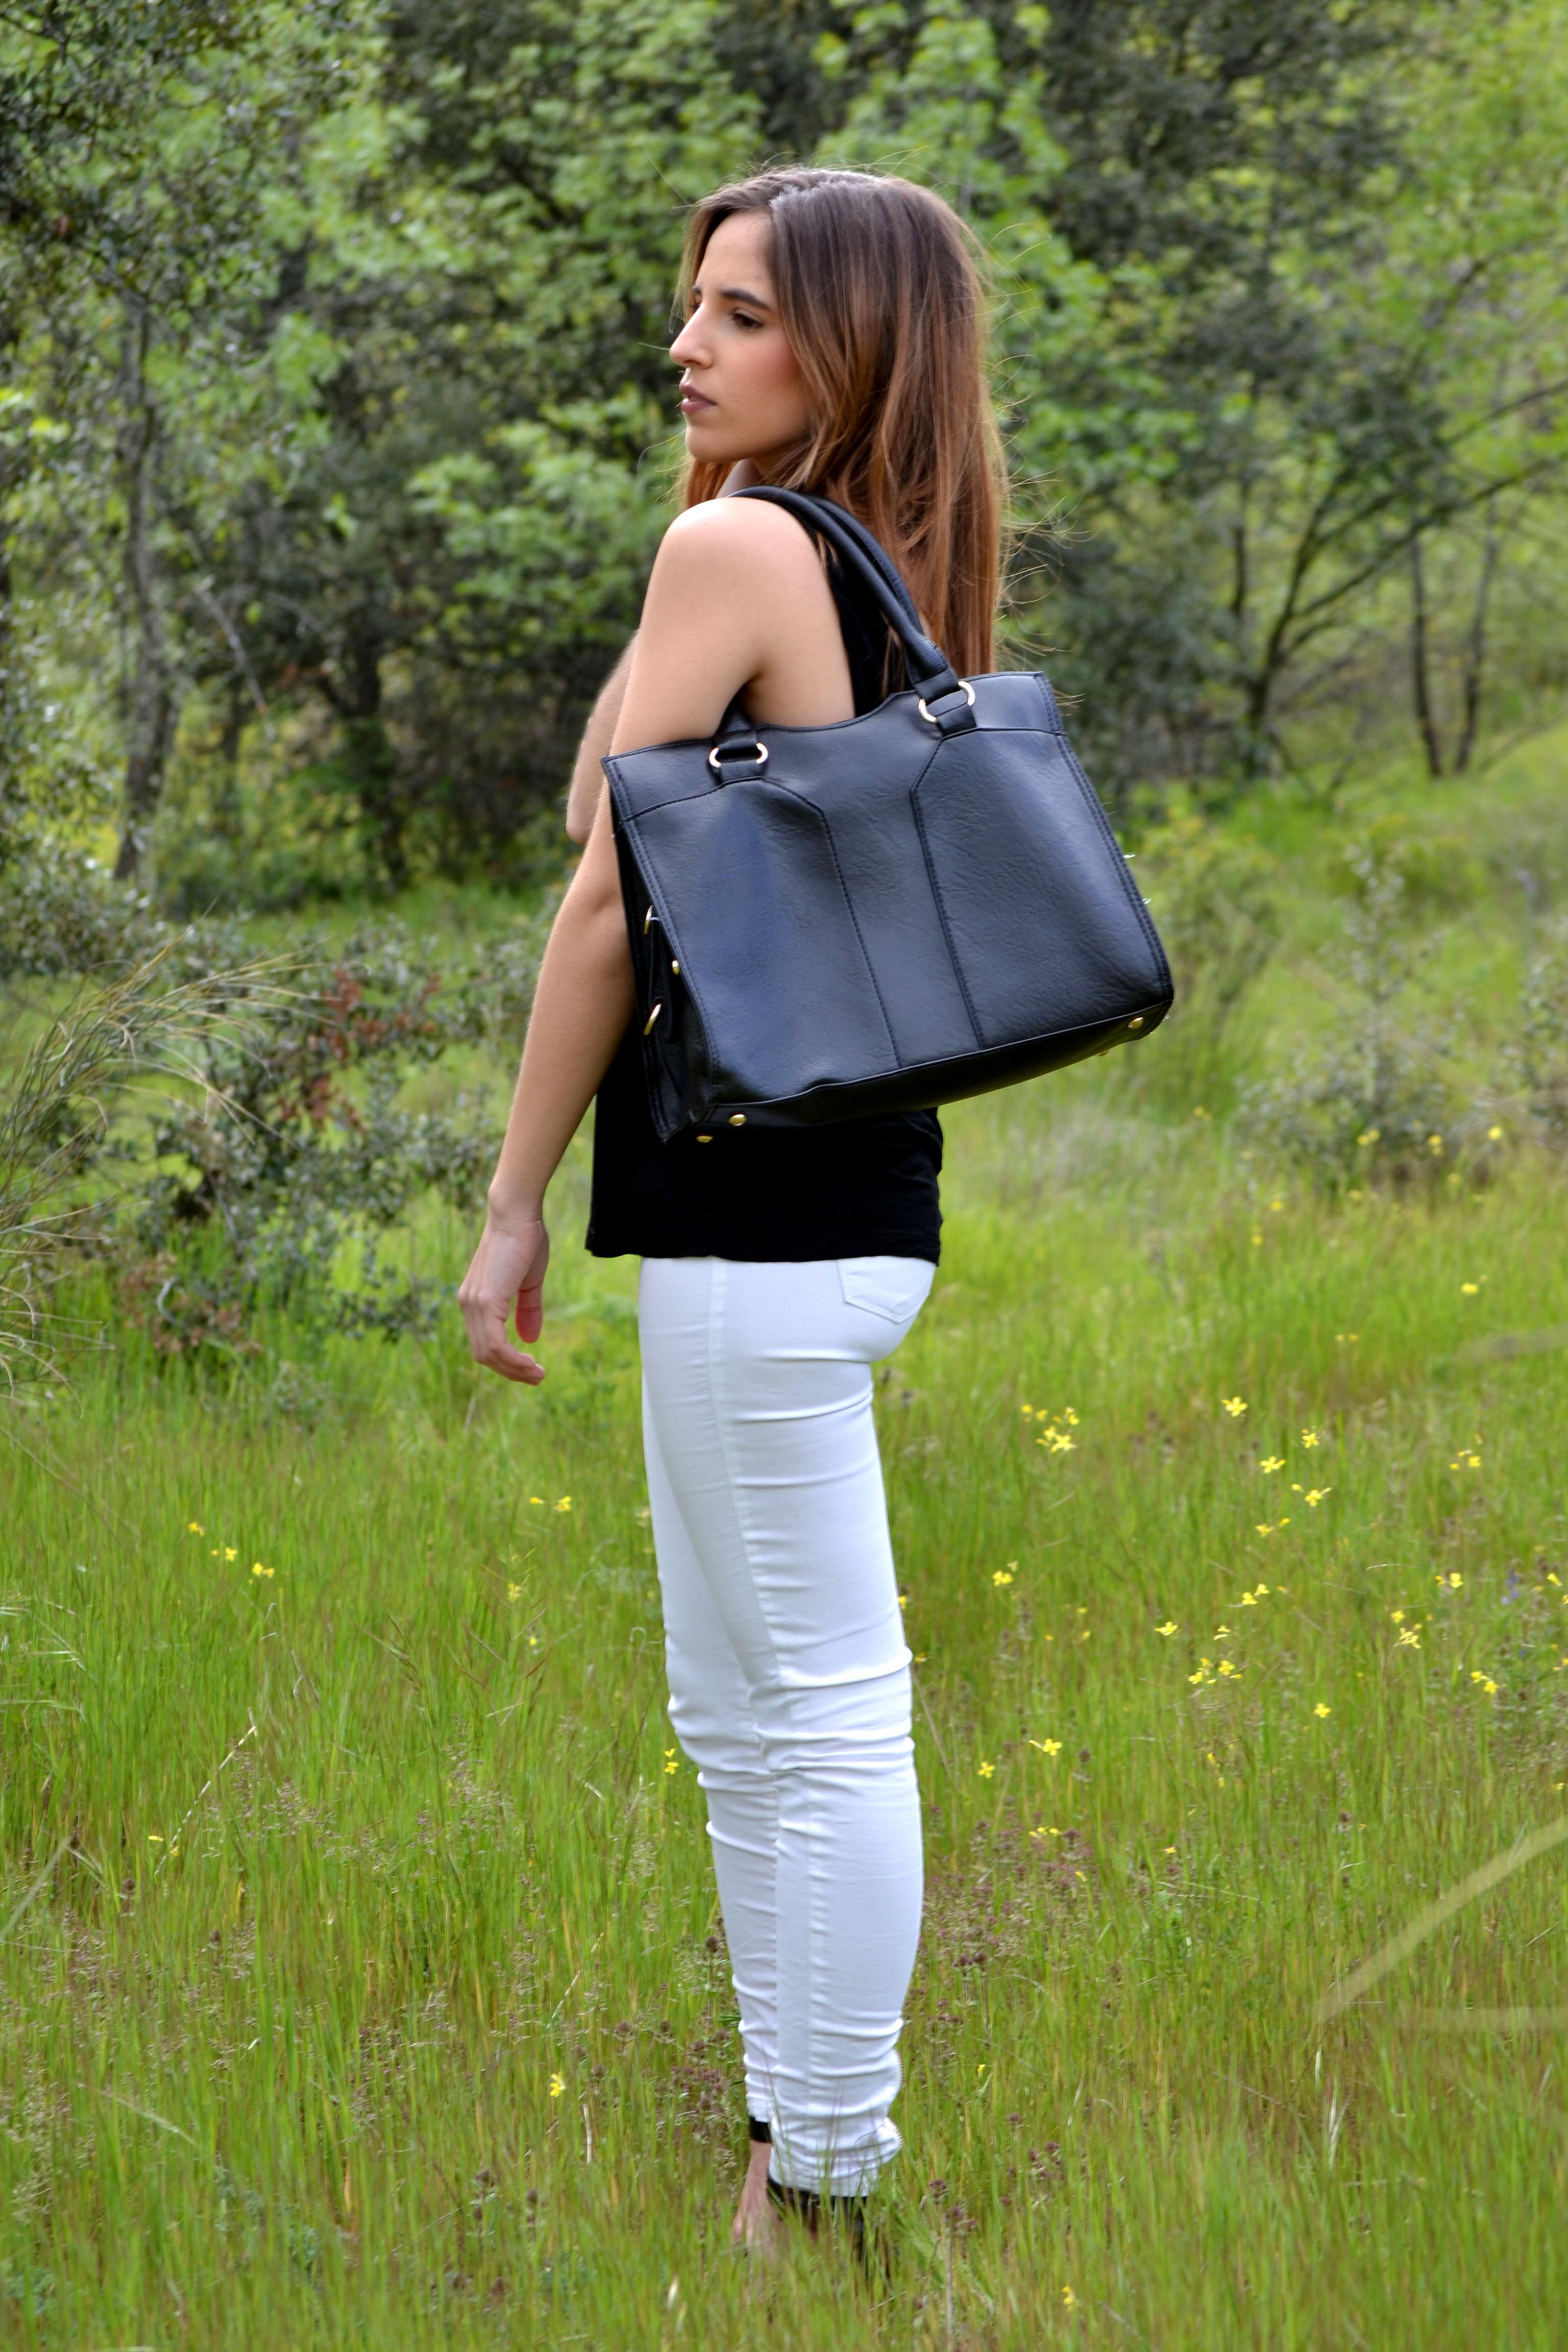 22c6fb1e7694b ... verano! la reina del low cost blog moda barata style outfitt camiseta  basica h m negra pantalones bershka